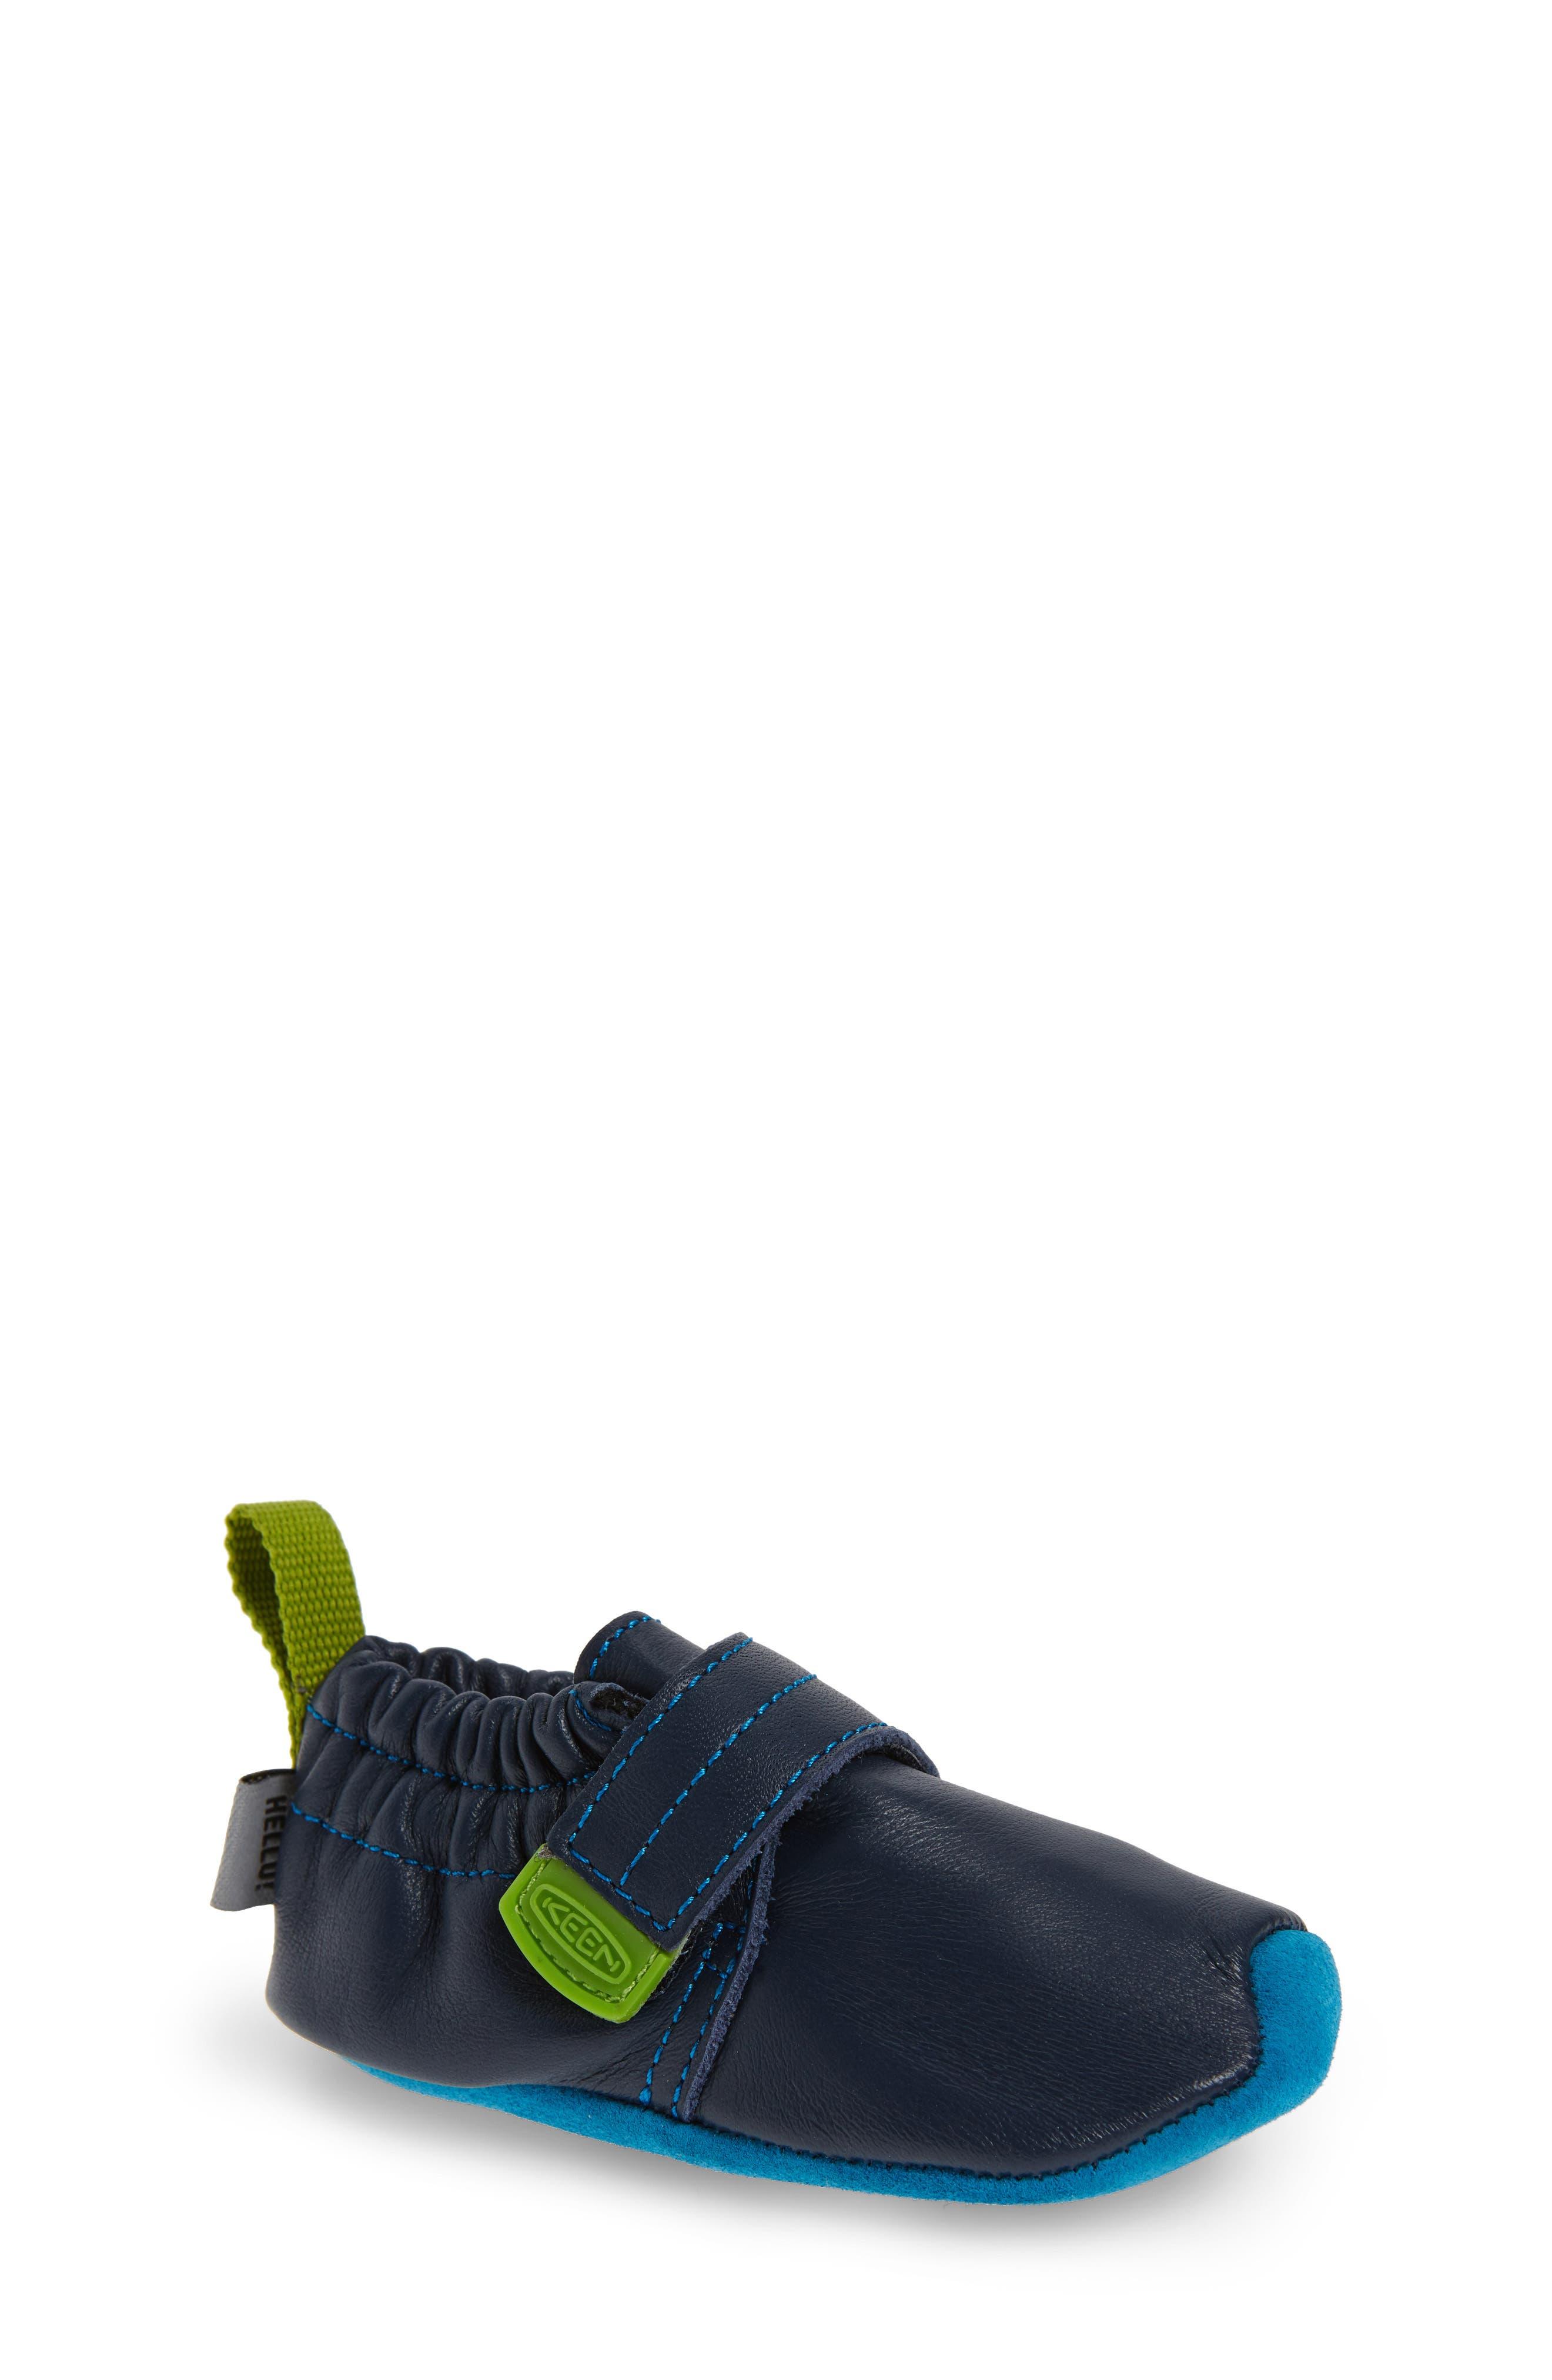 Image of Keen Leo Crib Shoe